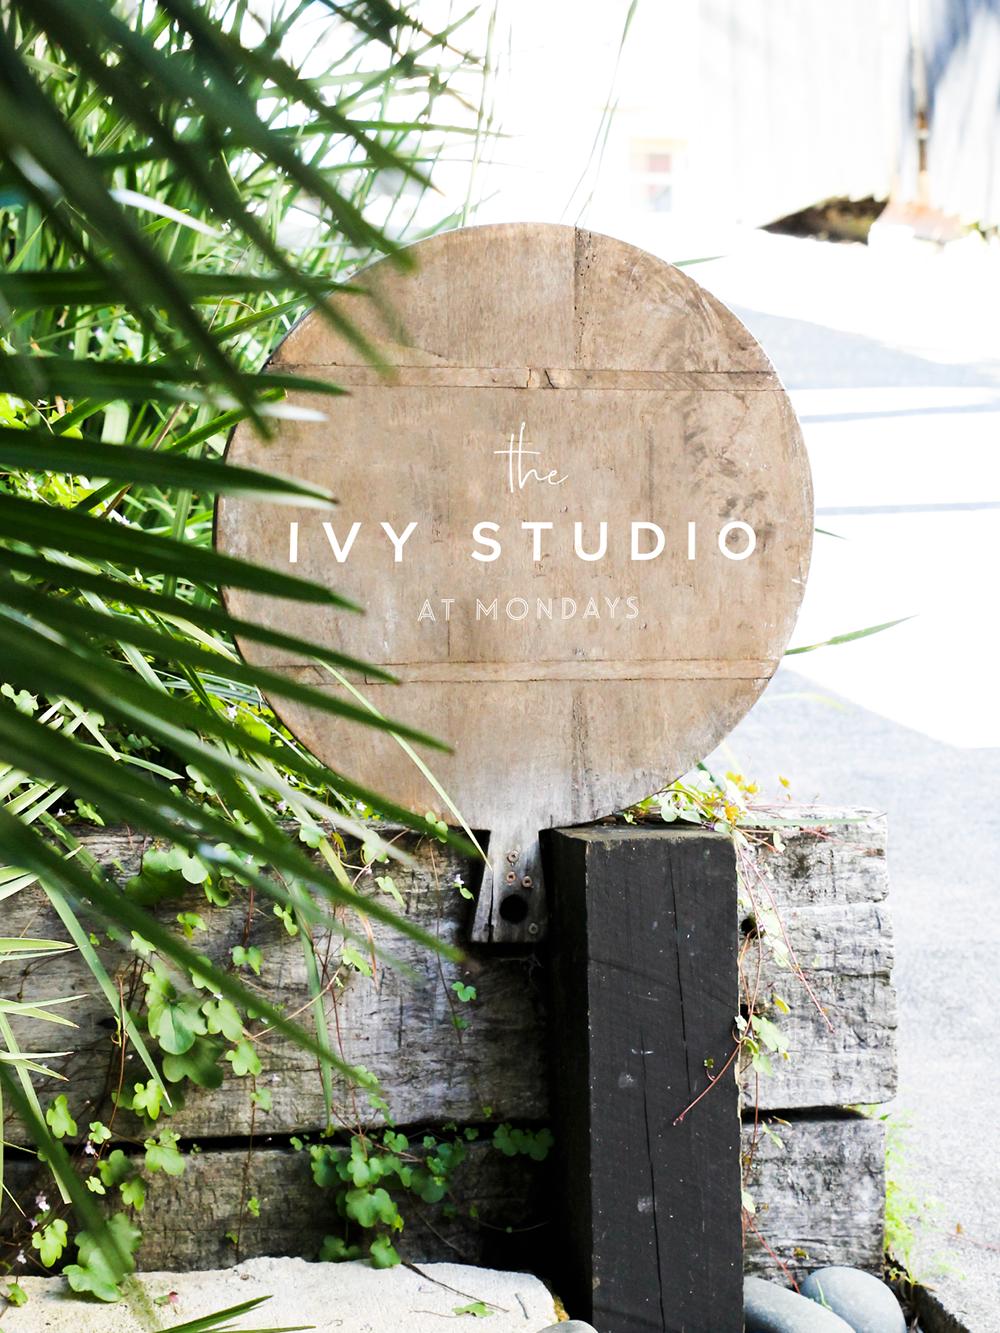 The Ivy Studio32.png